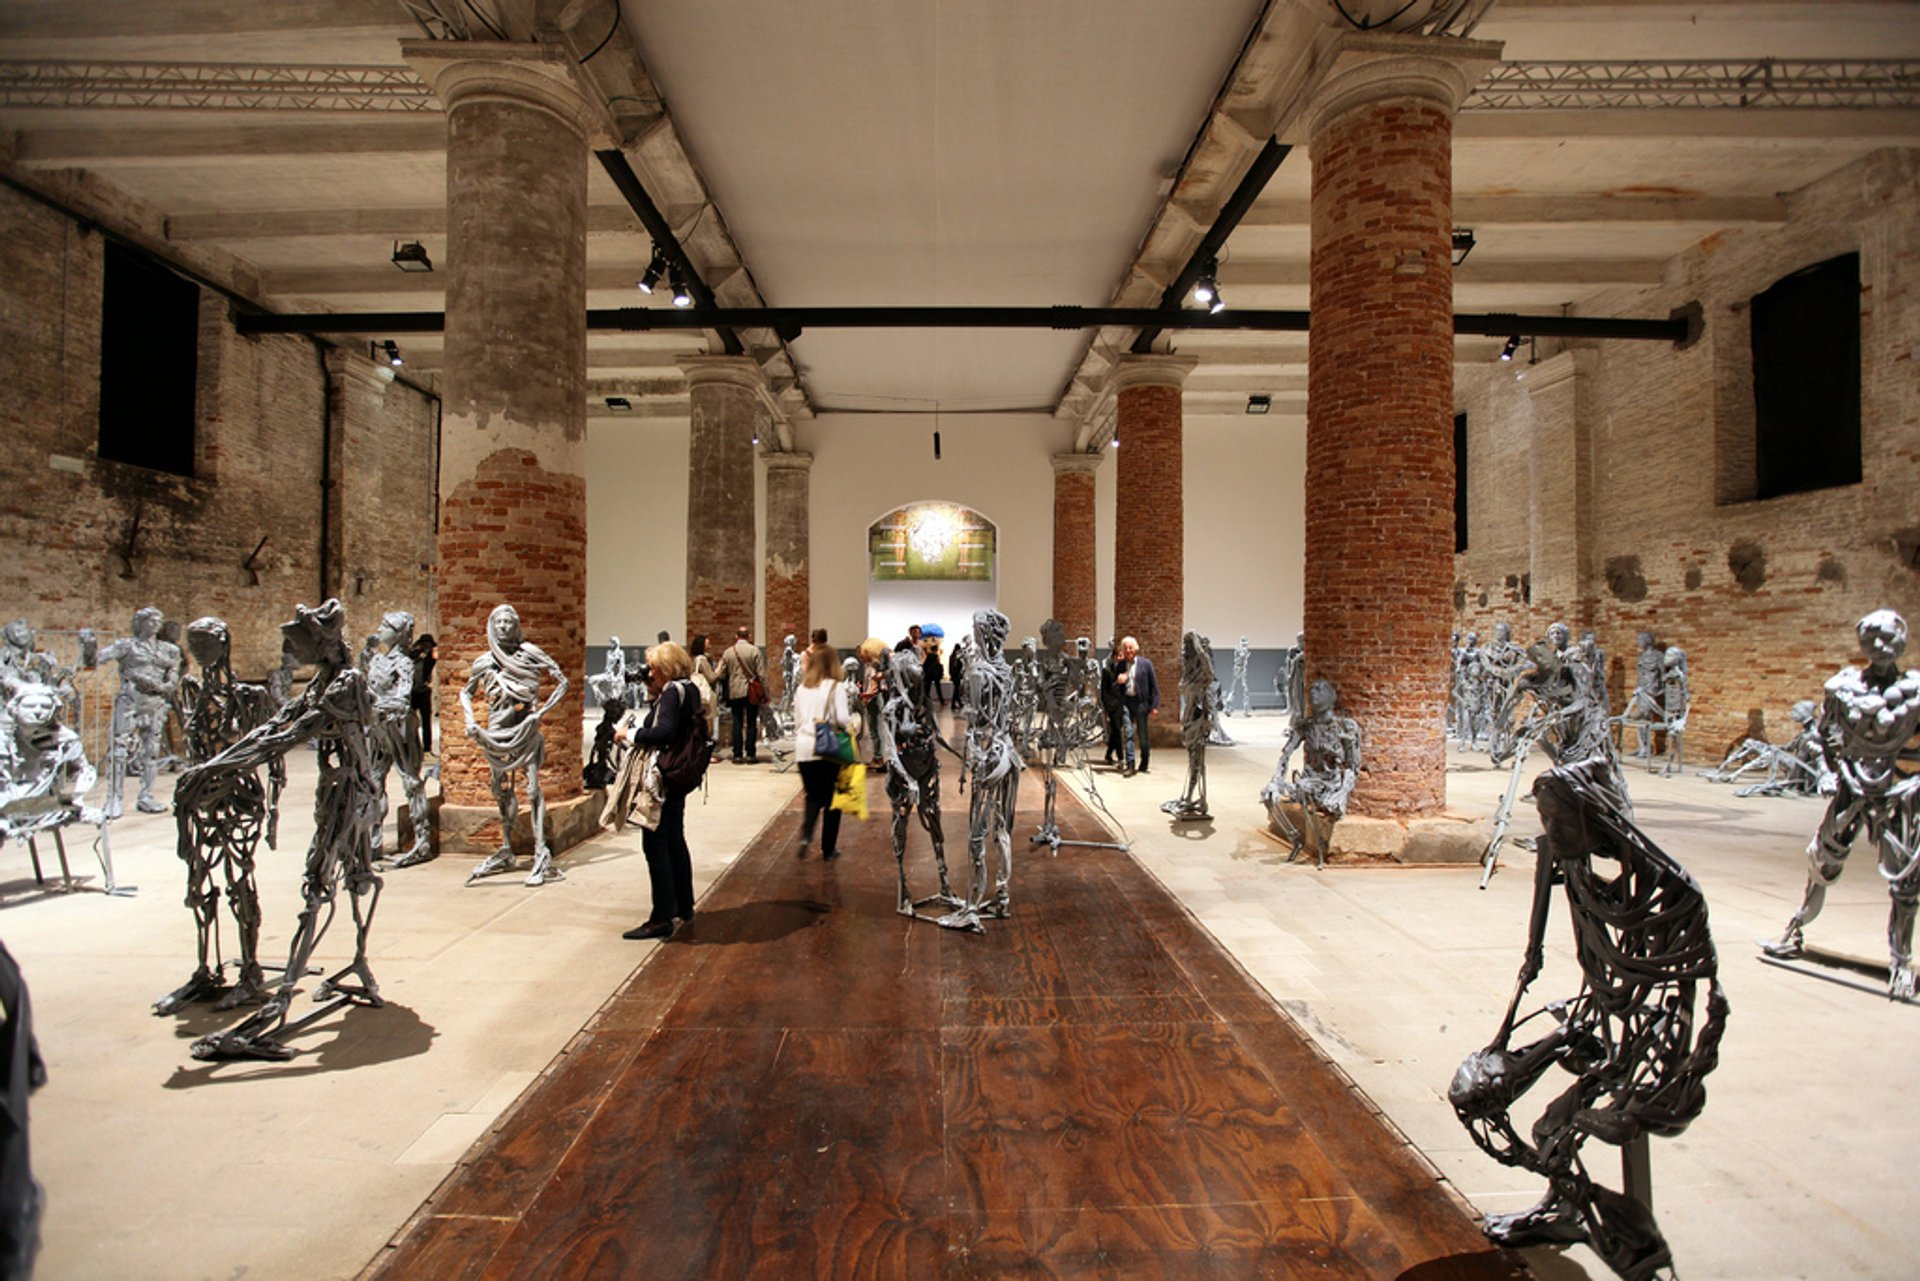 Best time to see La Biennale di Venezia (Venice Biennale) 2020